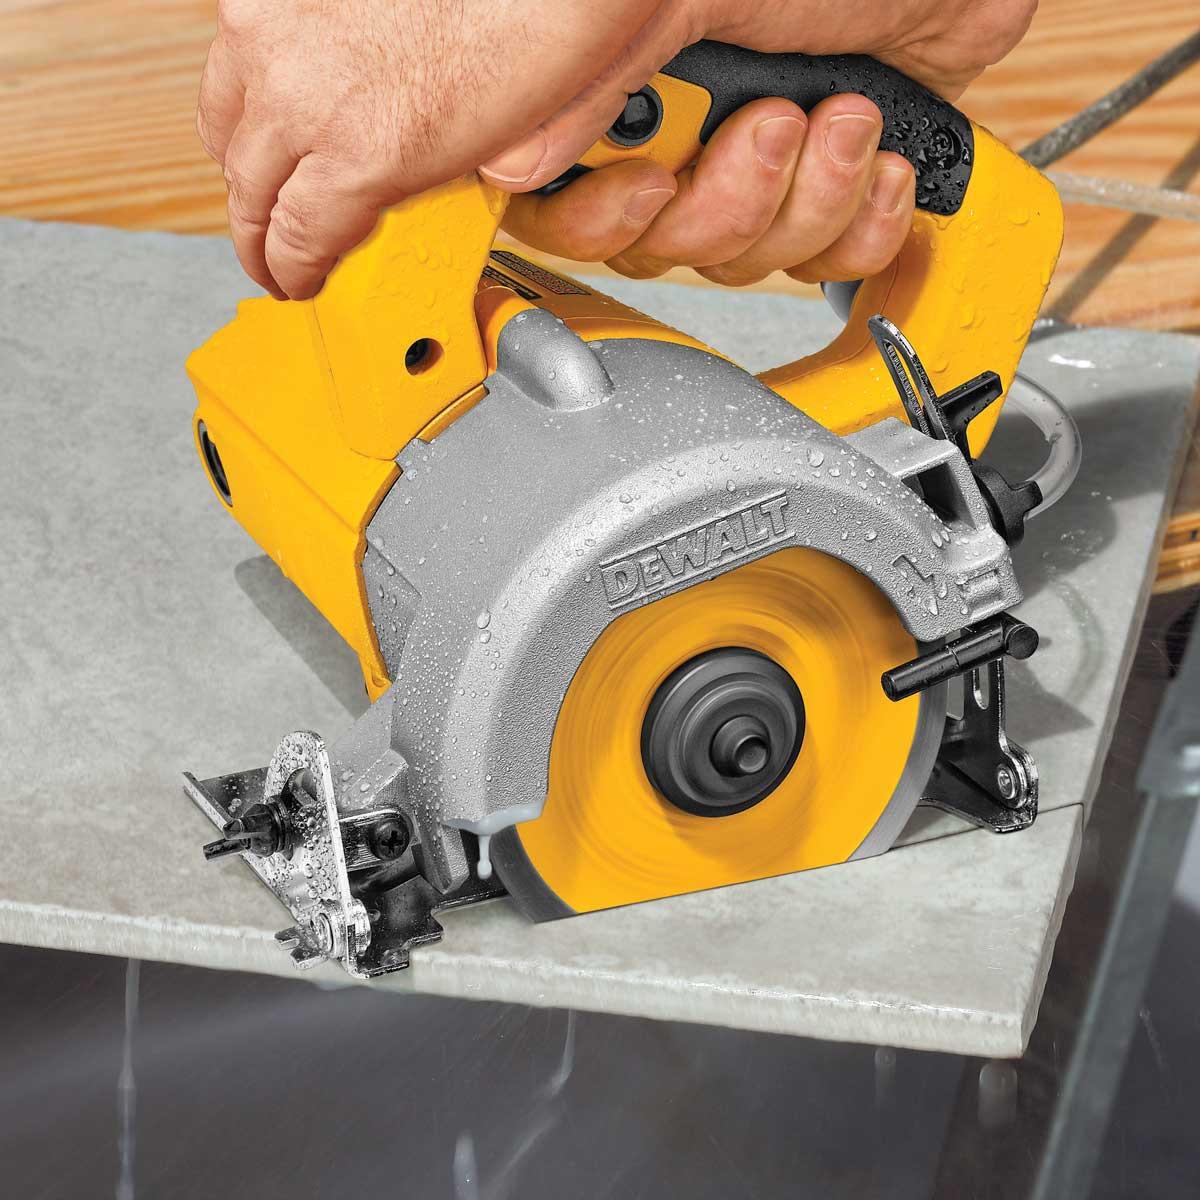 Dewalt Heavy Duty Wet Dry Tile Saw Contractors Direct